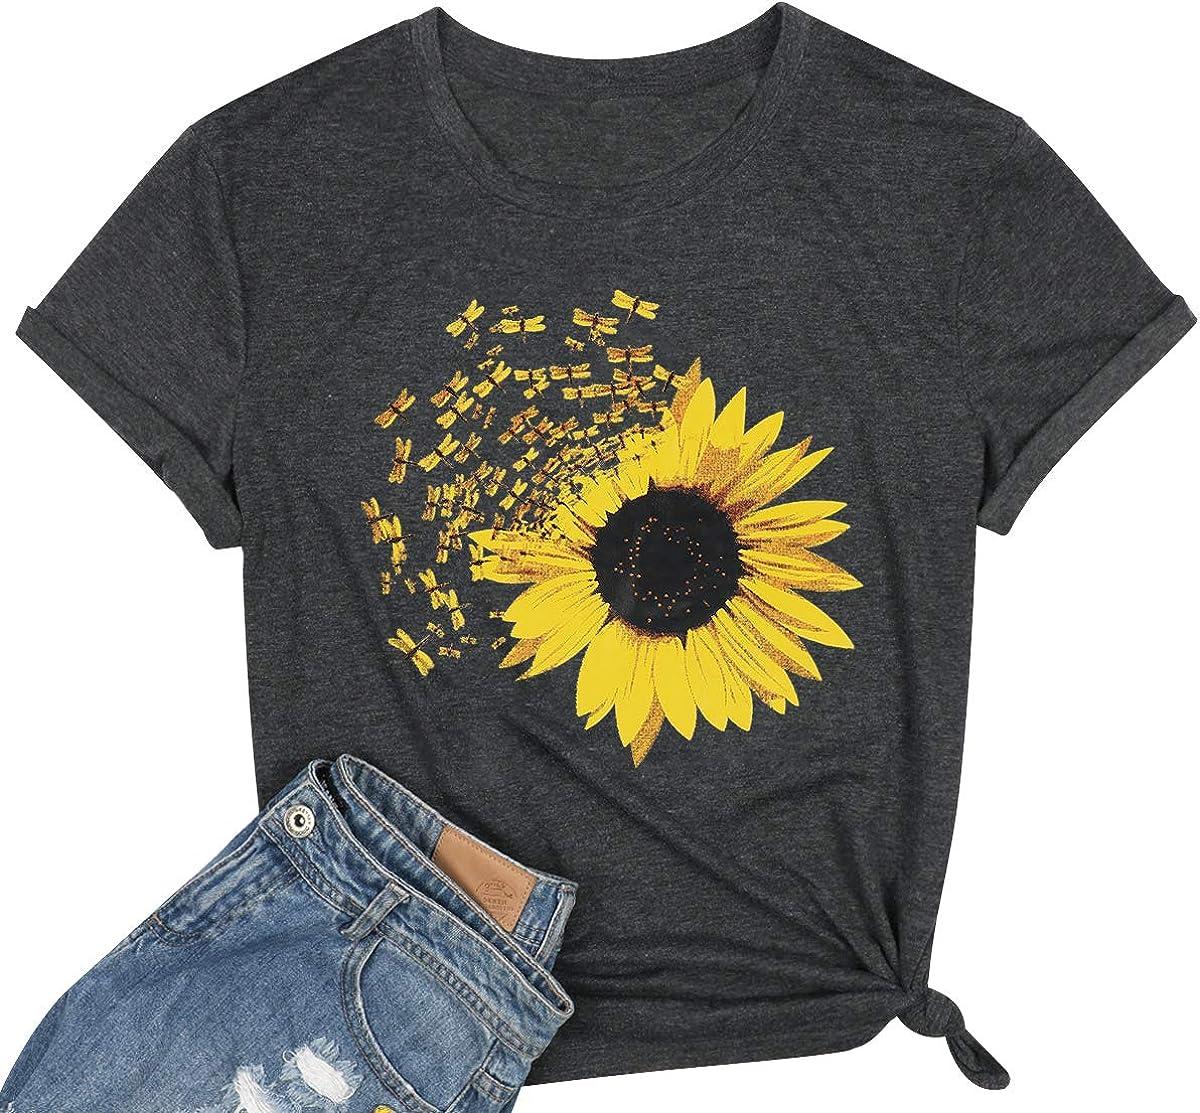 Sunflower Shirts for Women Cute Graphics Dandelion New item Credence Summer Tshirt